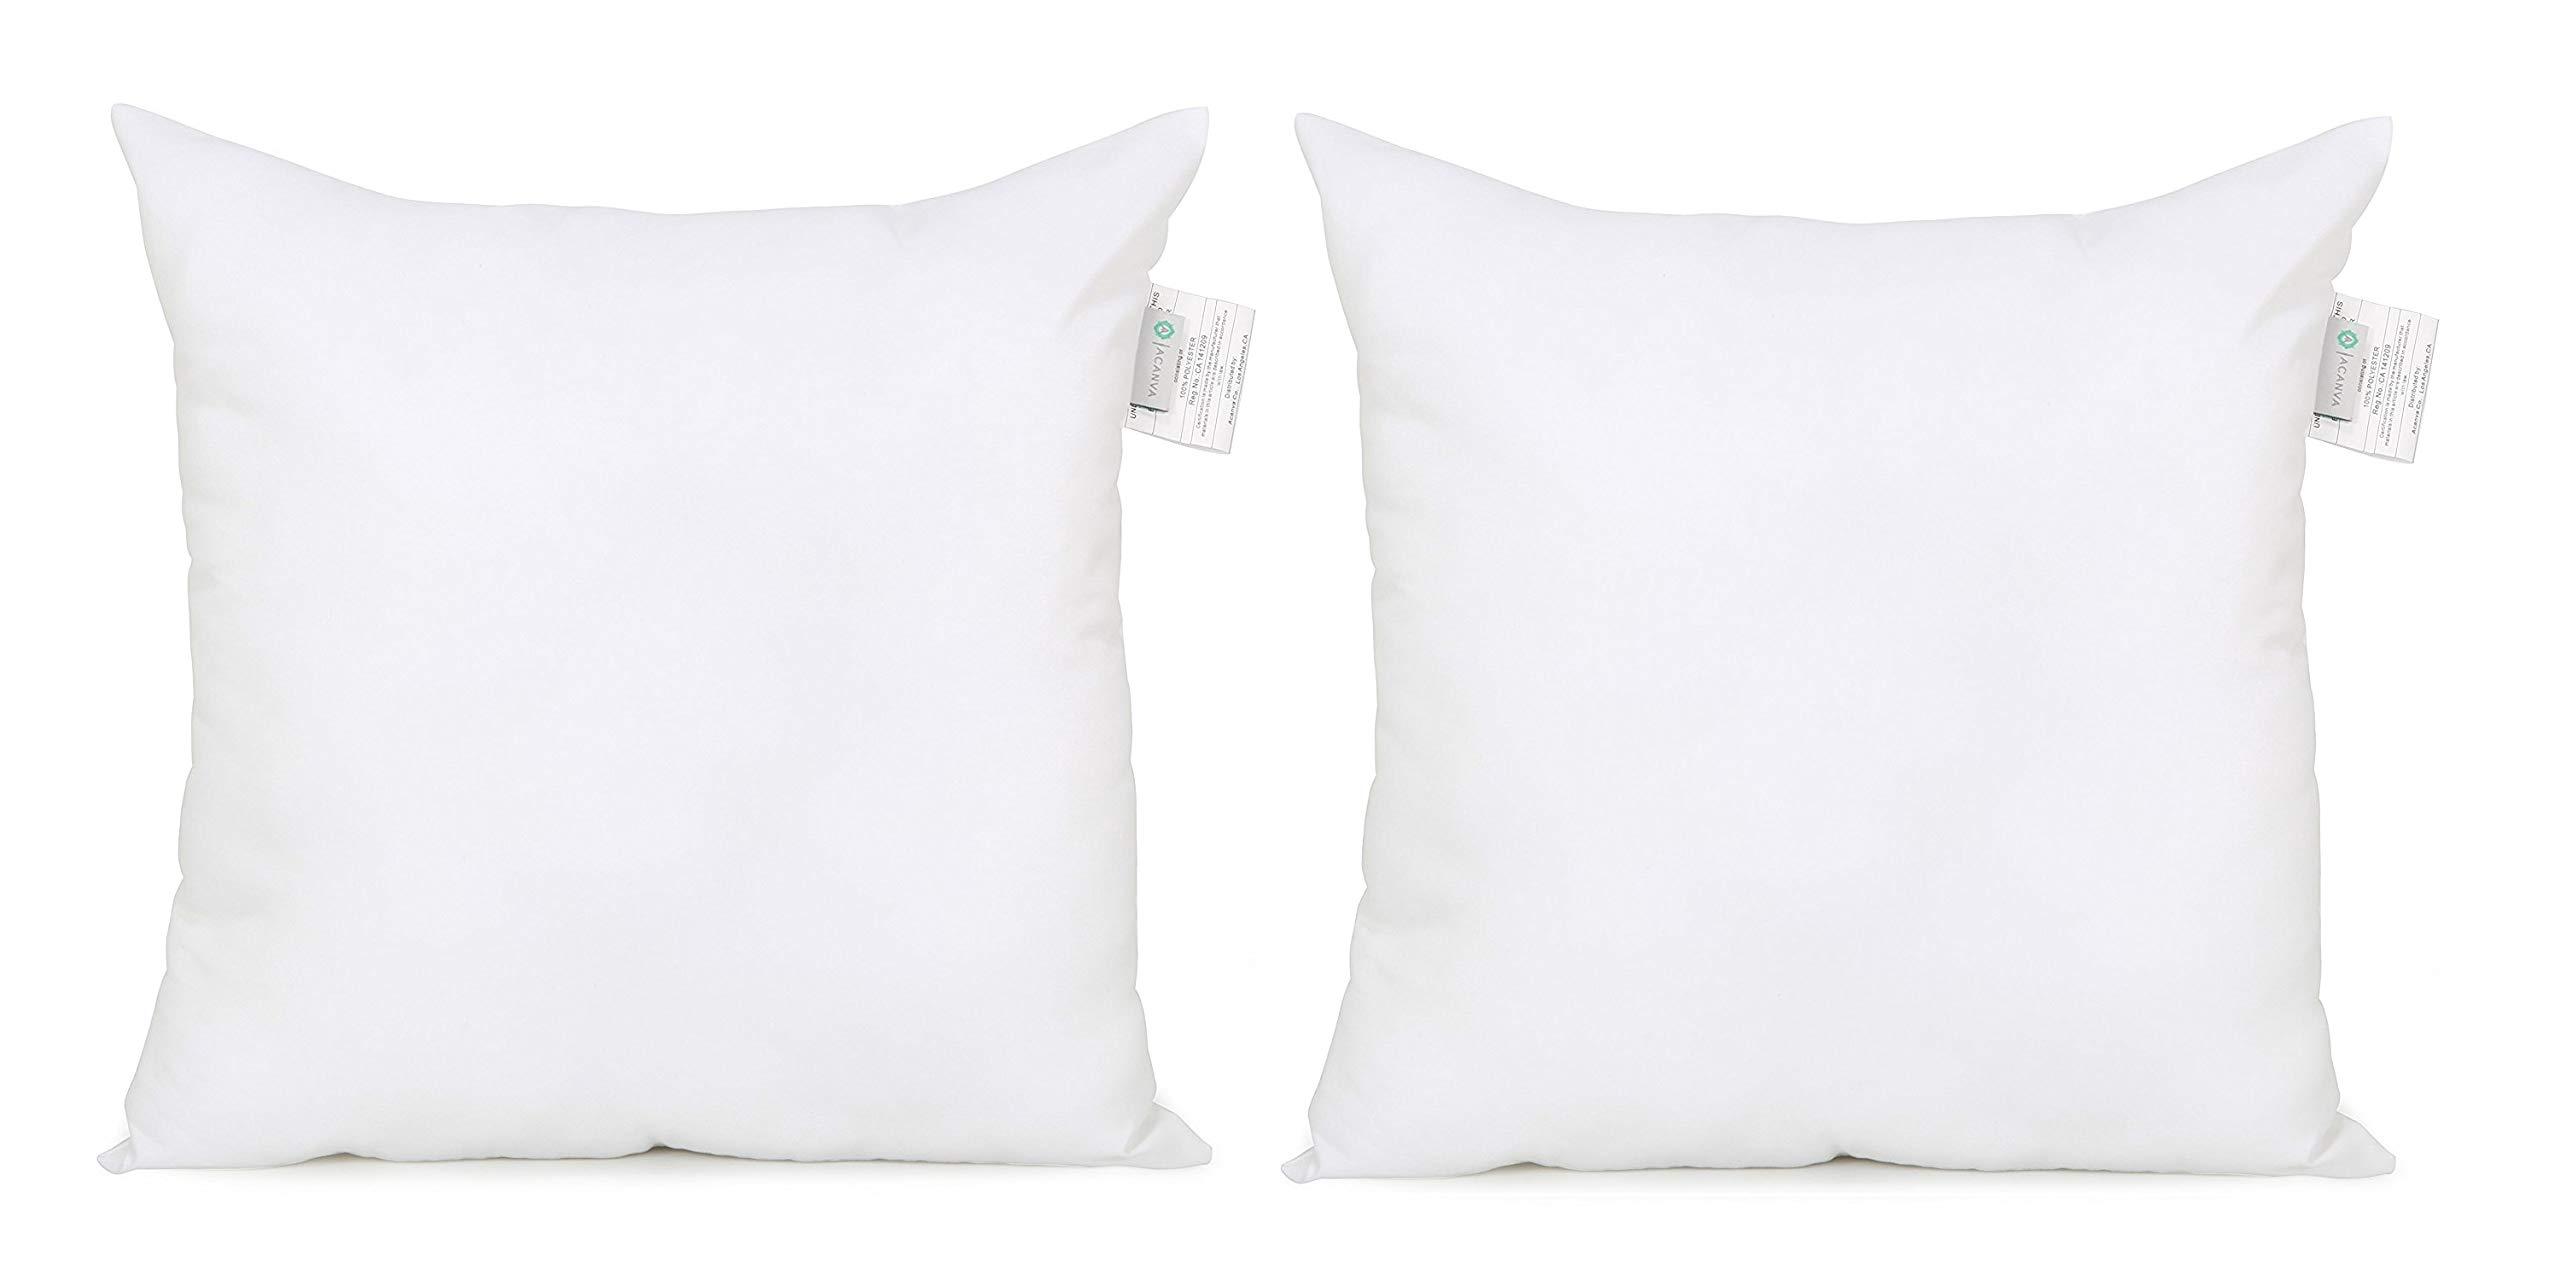 Acanva Down Alternative Throw Pillow Inserts Hypoallergenic Square Soft Form Stuffer Decorative Cushion Sham Filler, 24 x 24, White 2 Piece